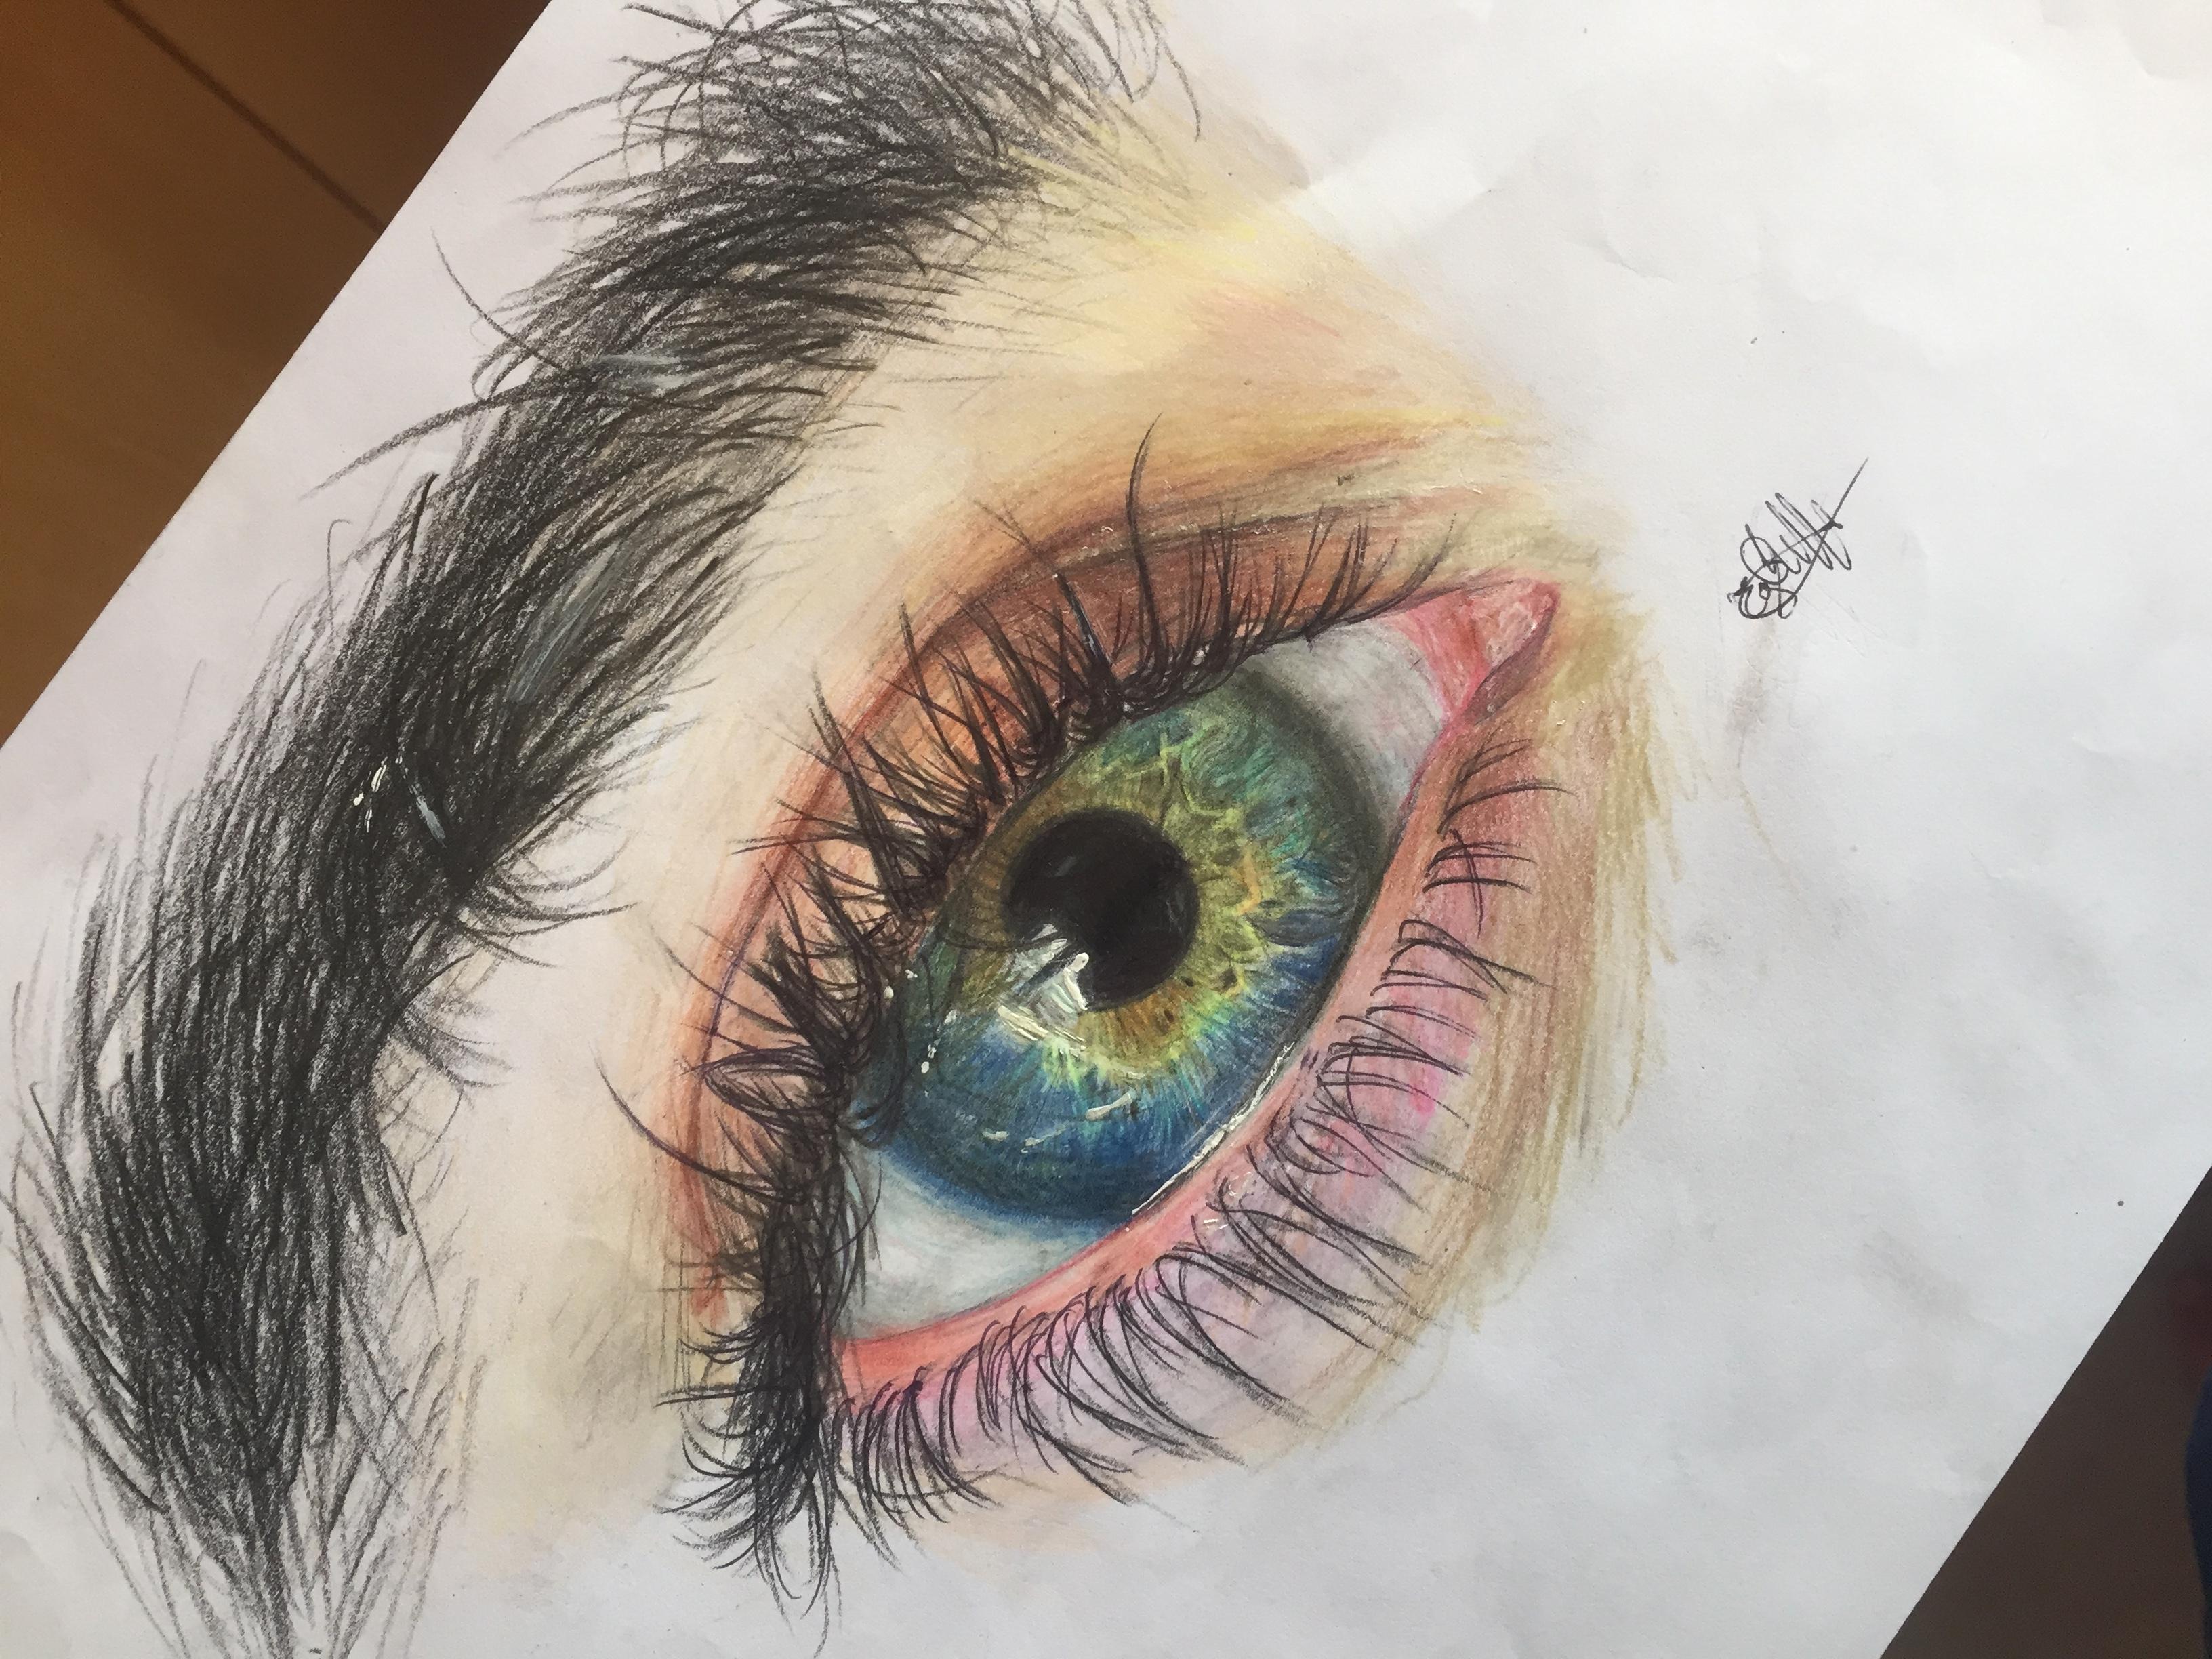 Dessin Oeil Realiste Pencildrawing Fr